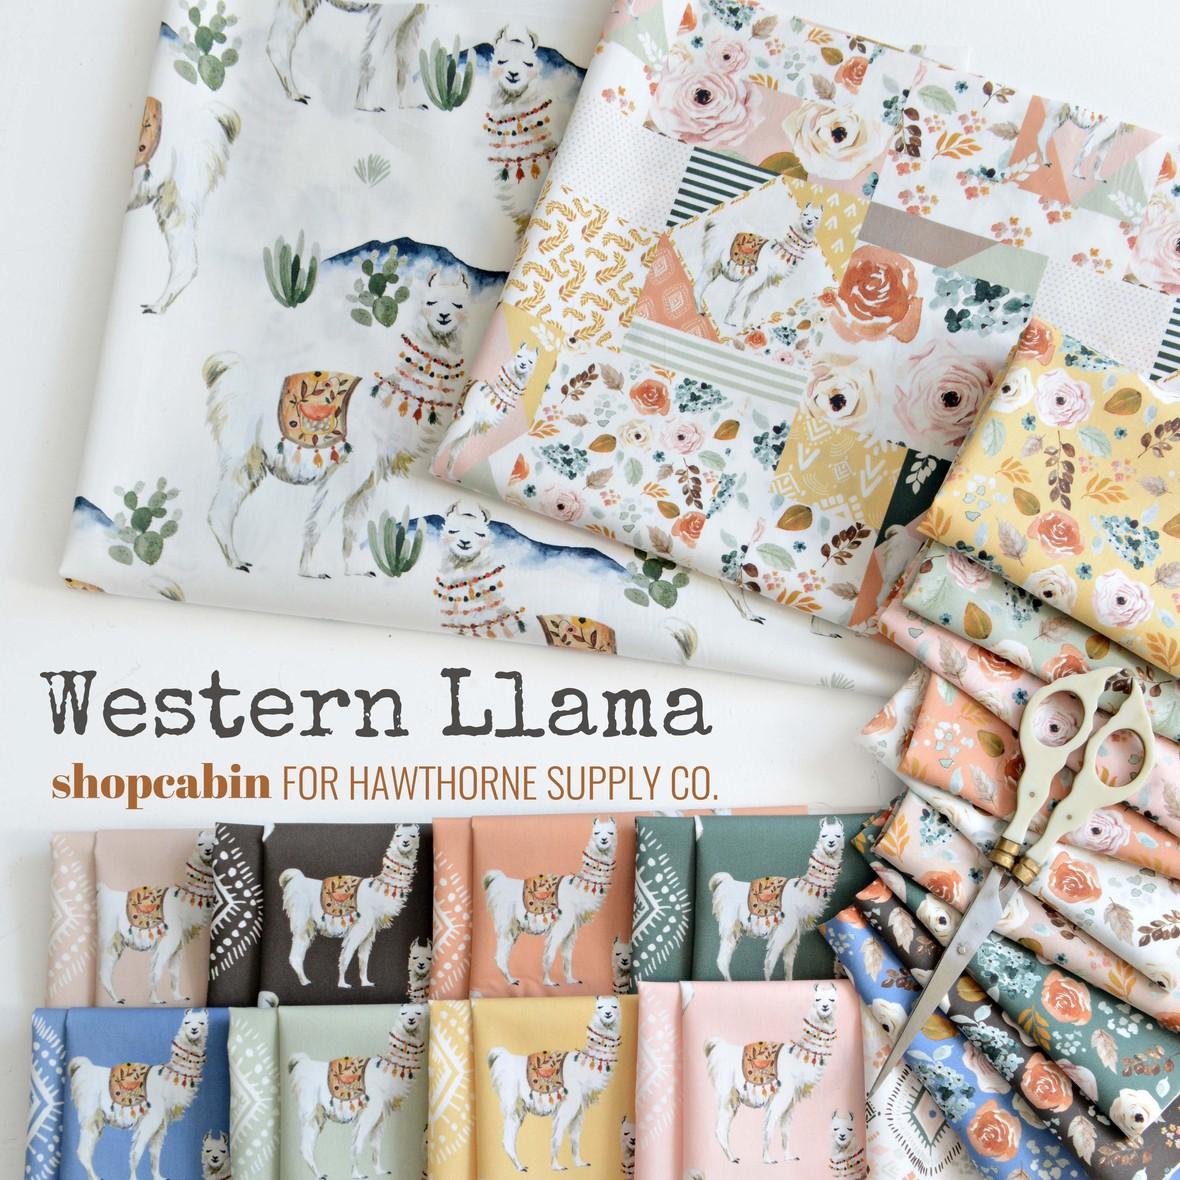 Western Llama Fabric Shopcabin at Hawthorne Supply Co